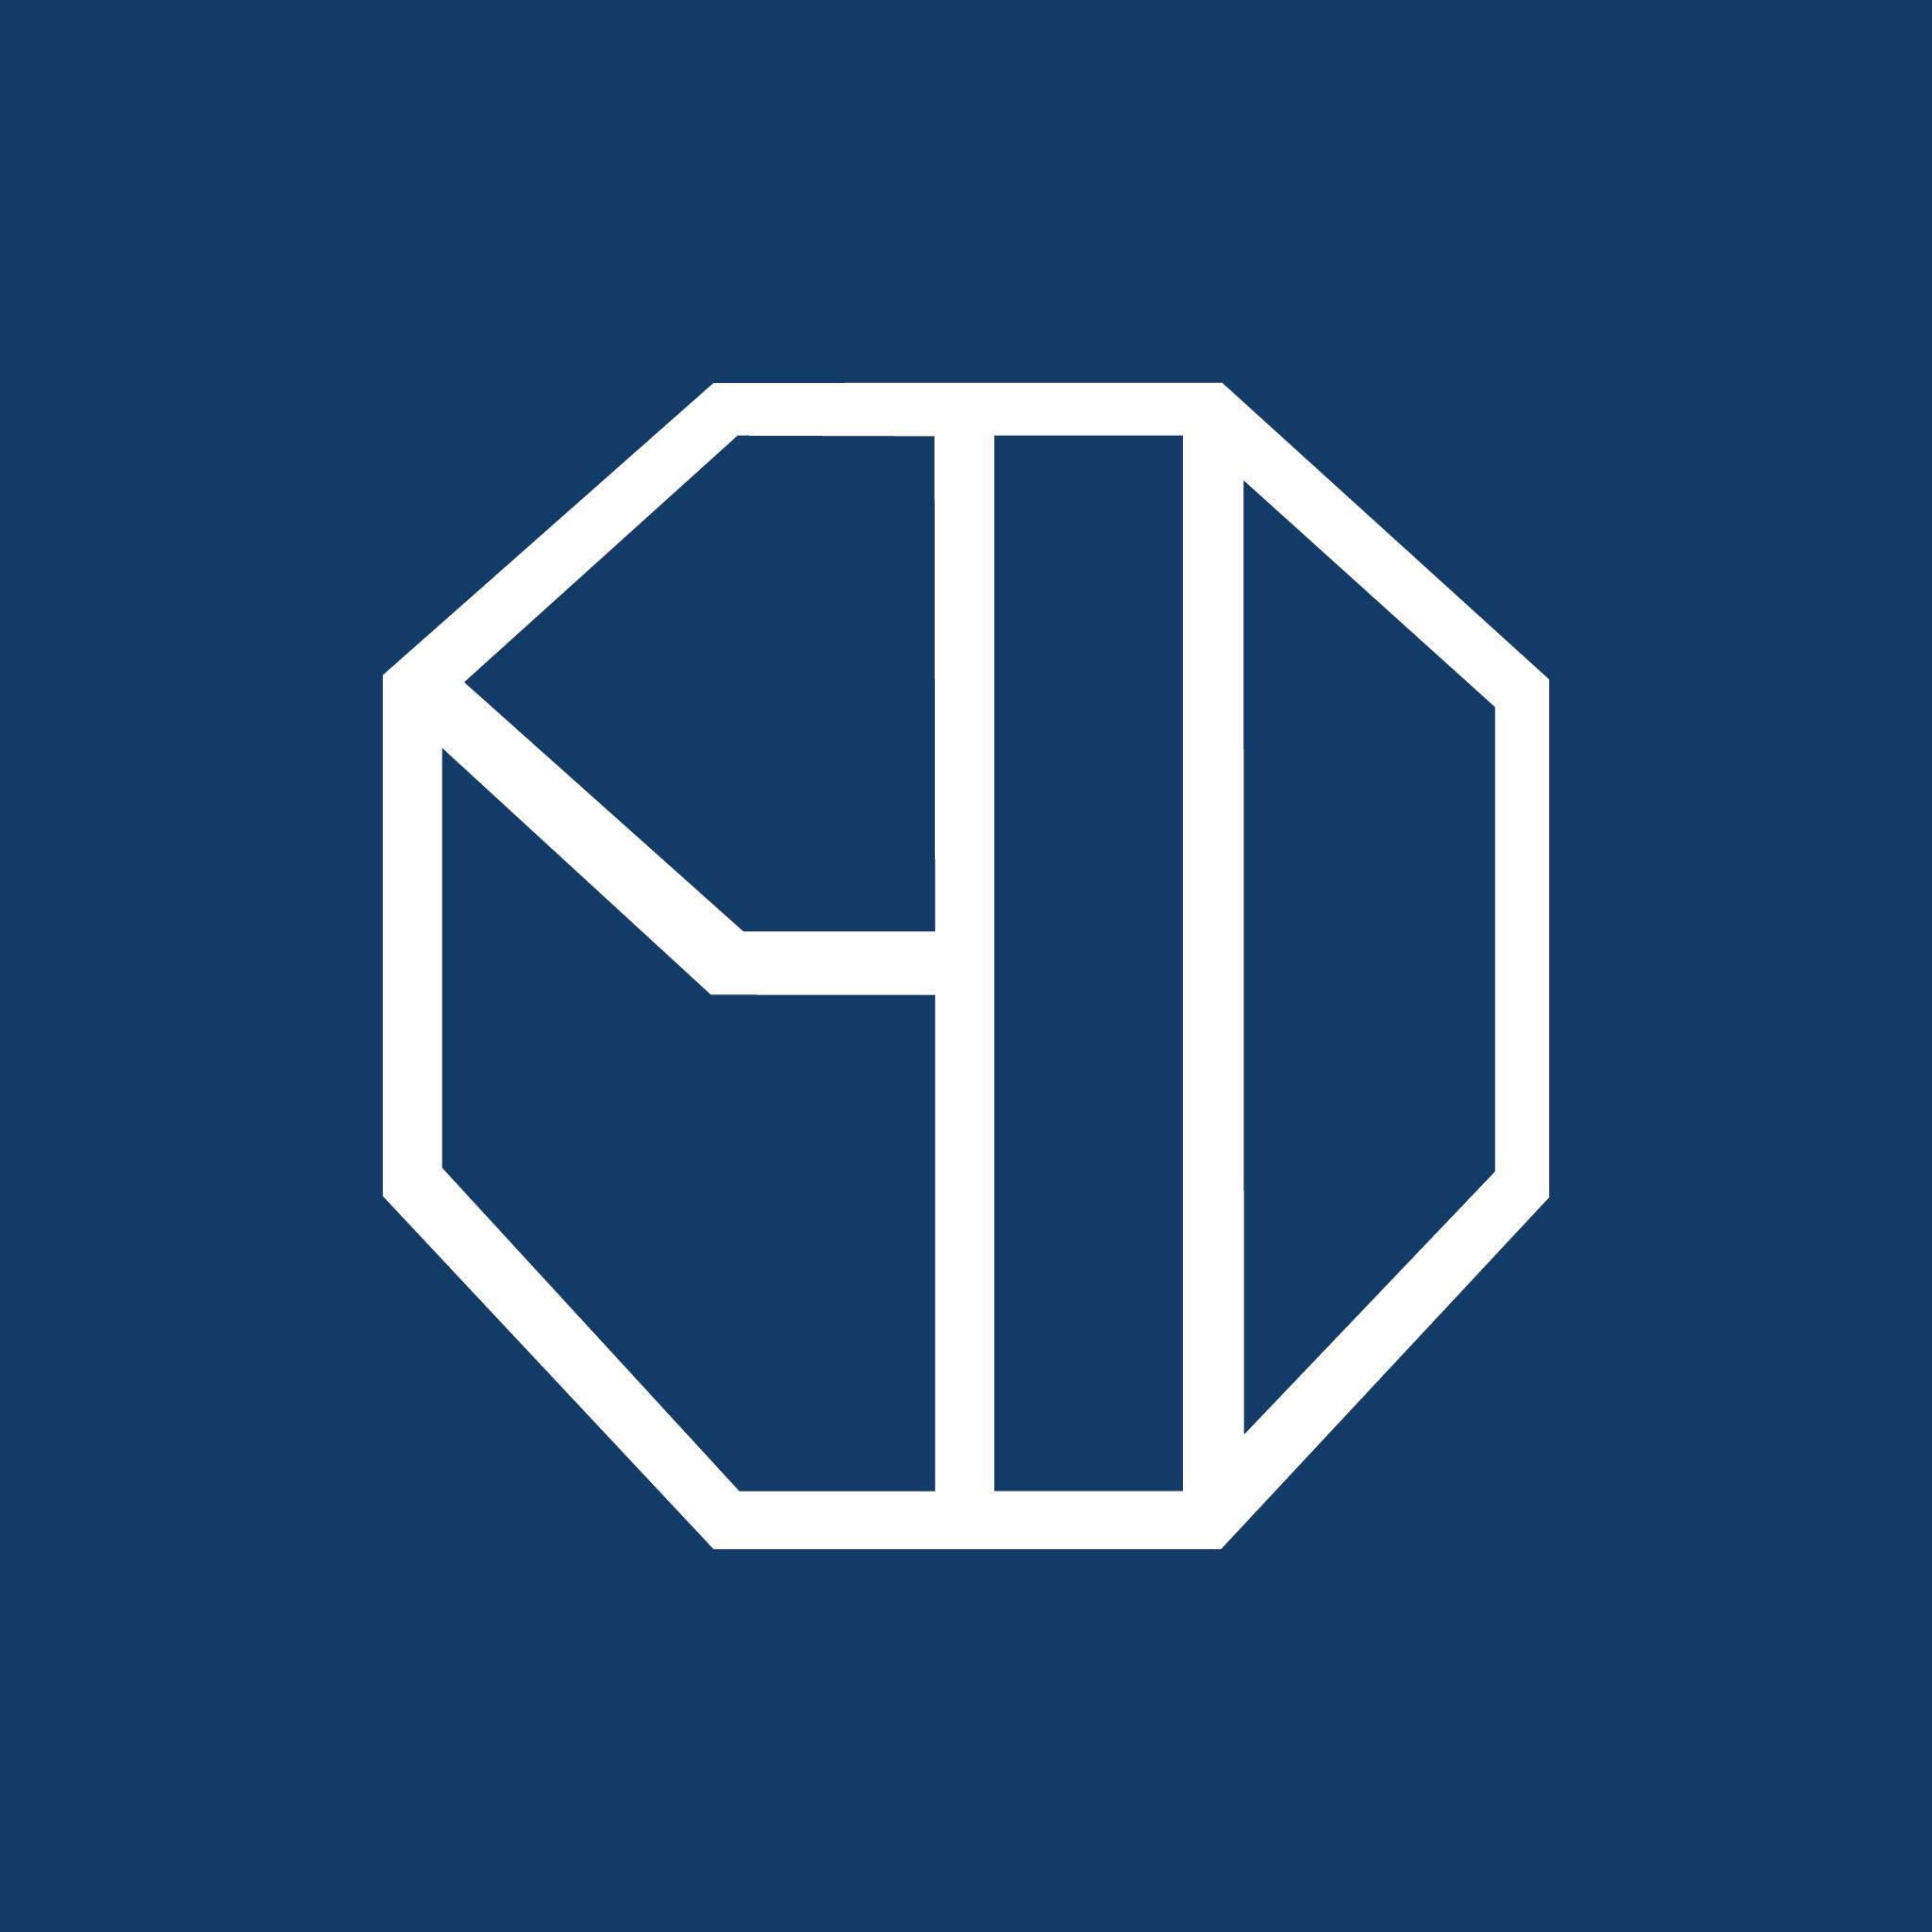 91interactive GmbH